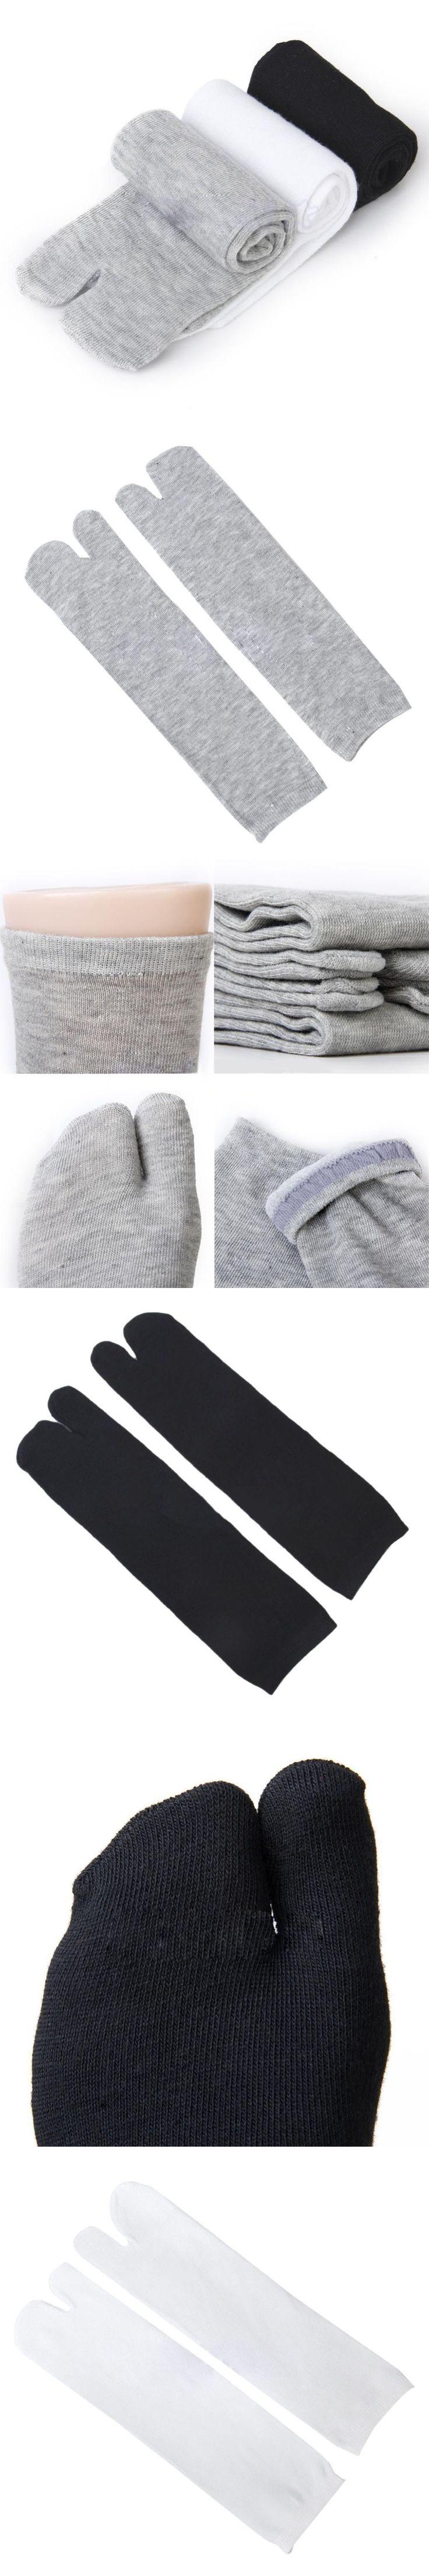 3 Pair Men Women Tabi Socks Split Two Toe Japanese Kimono Sandal Split Toe Geta Socks 7993